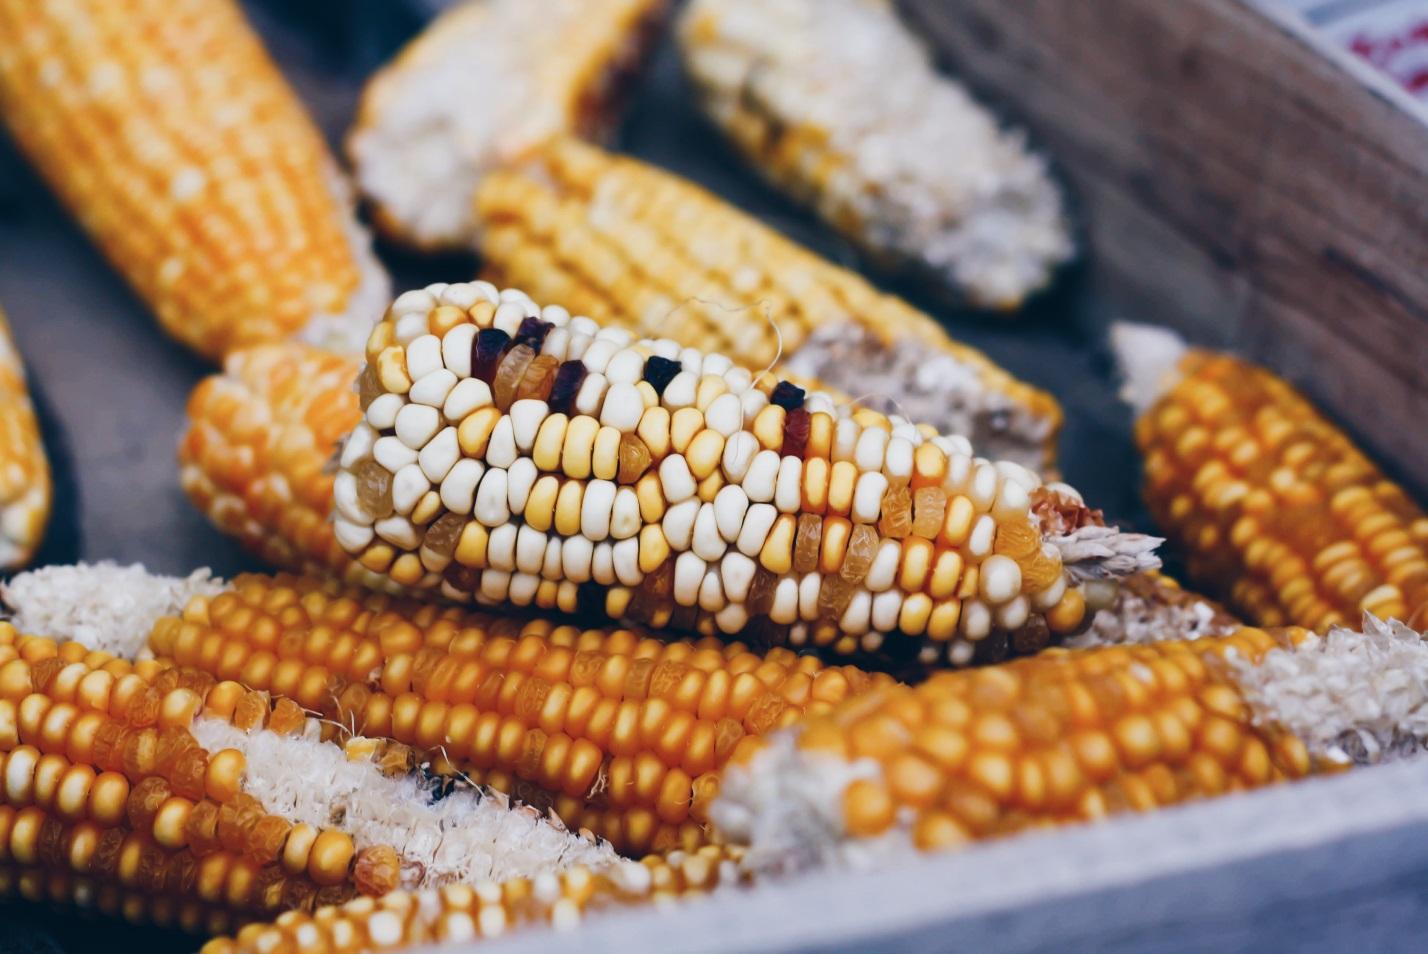 Nativeamericanjewelry Celebrates Native American Food